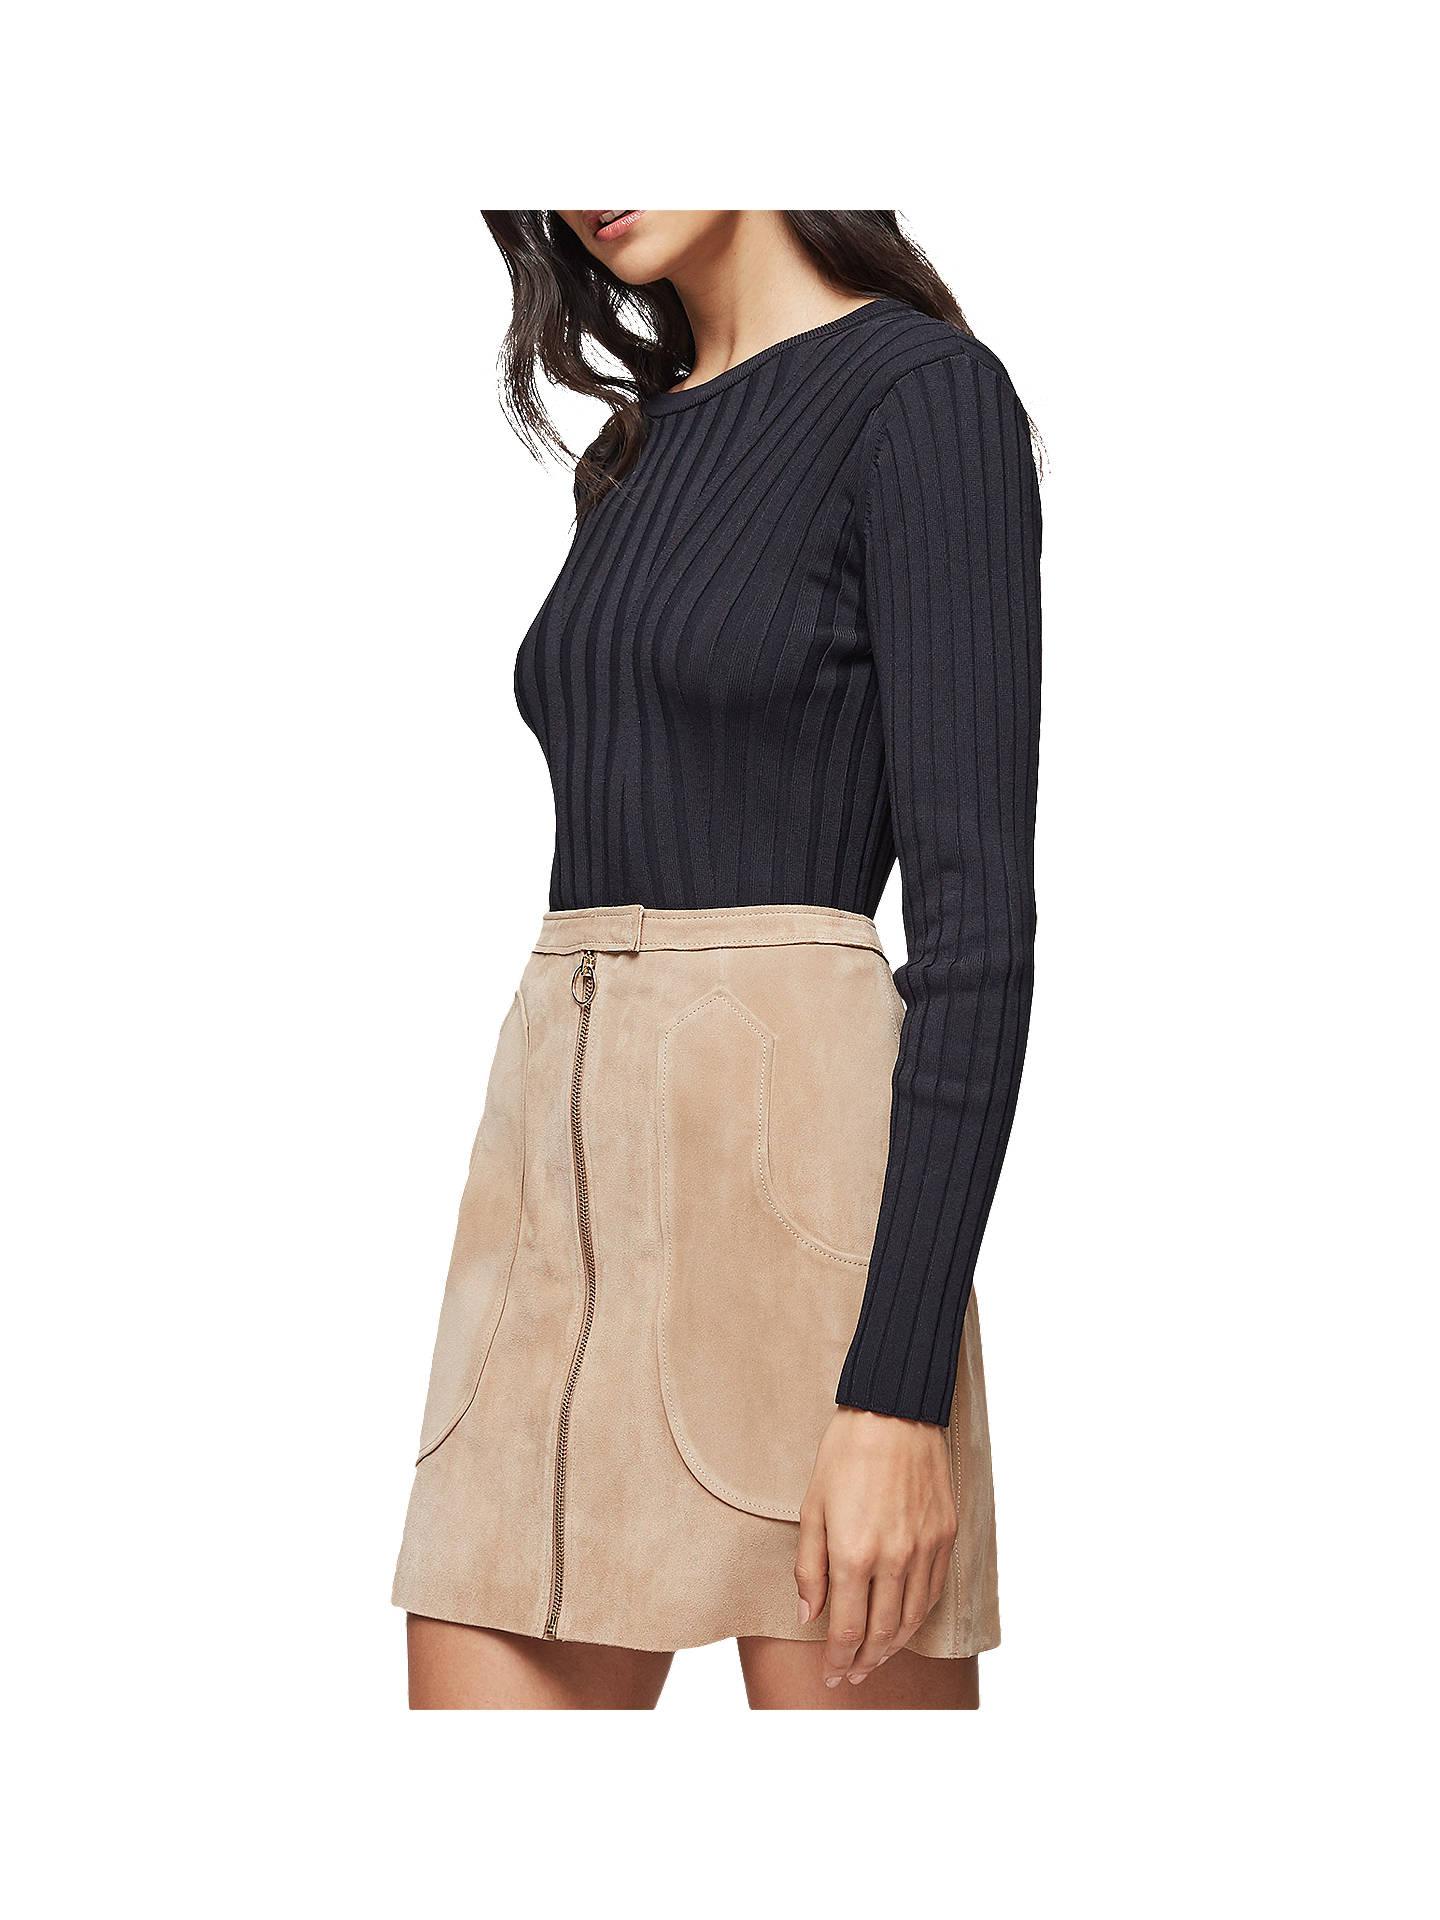 9df6abd61 ... Buy Reiss Keaton Suede Mini Skirt, Sand, 6 Online at johnlewis.com